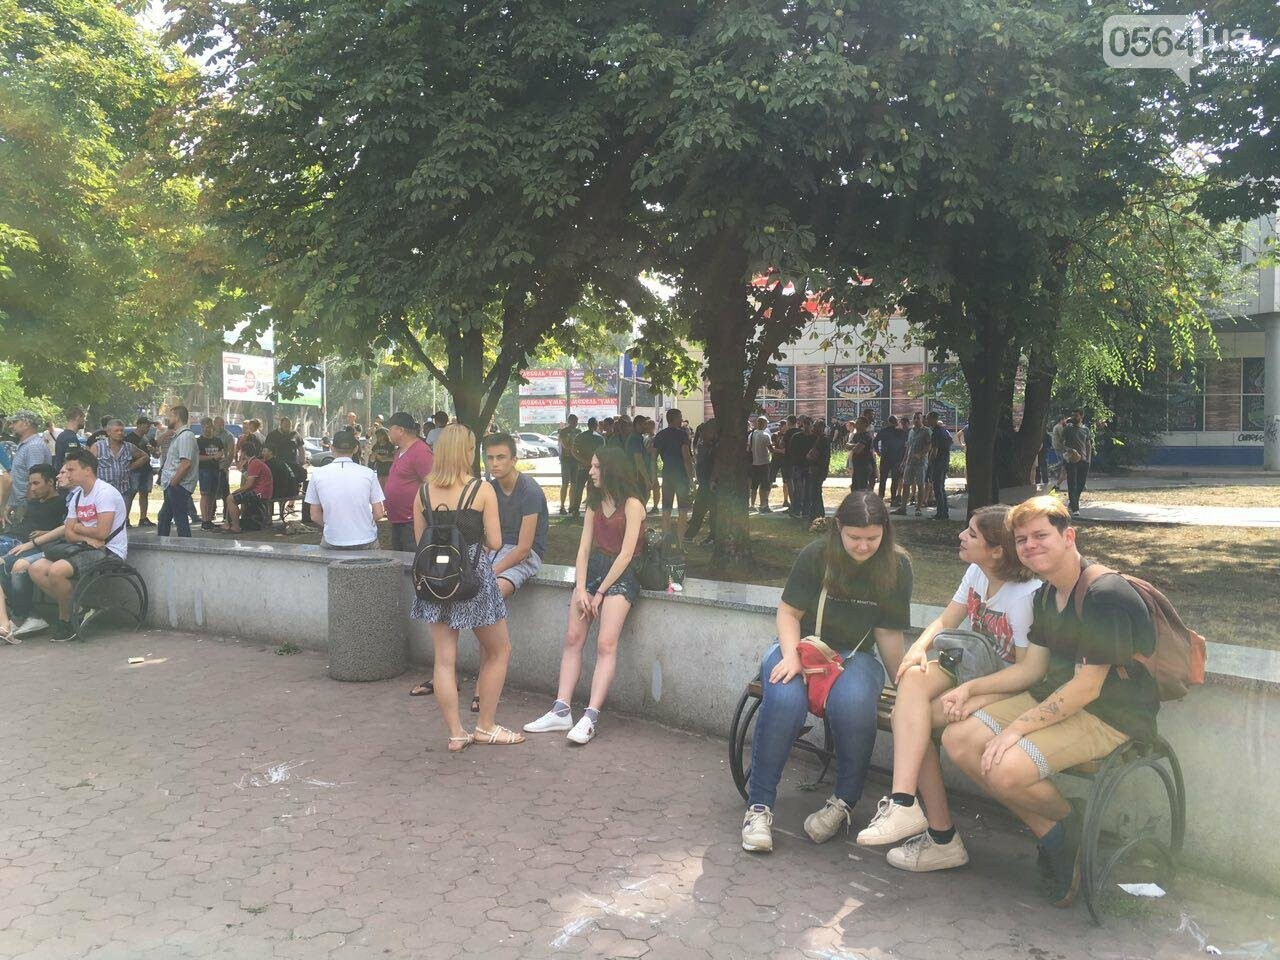 Трубят рога: В Кривом Роге собрались противники ЛГБТ-движения, - ФОТО, ВИДЕО, фото-8